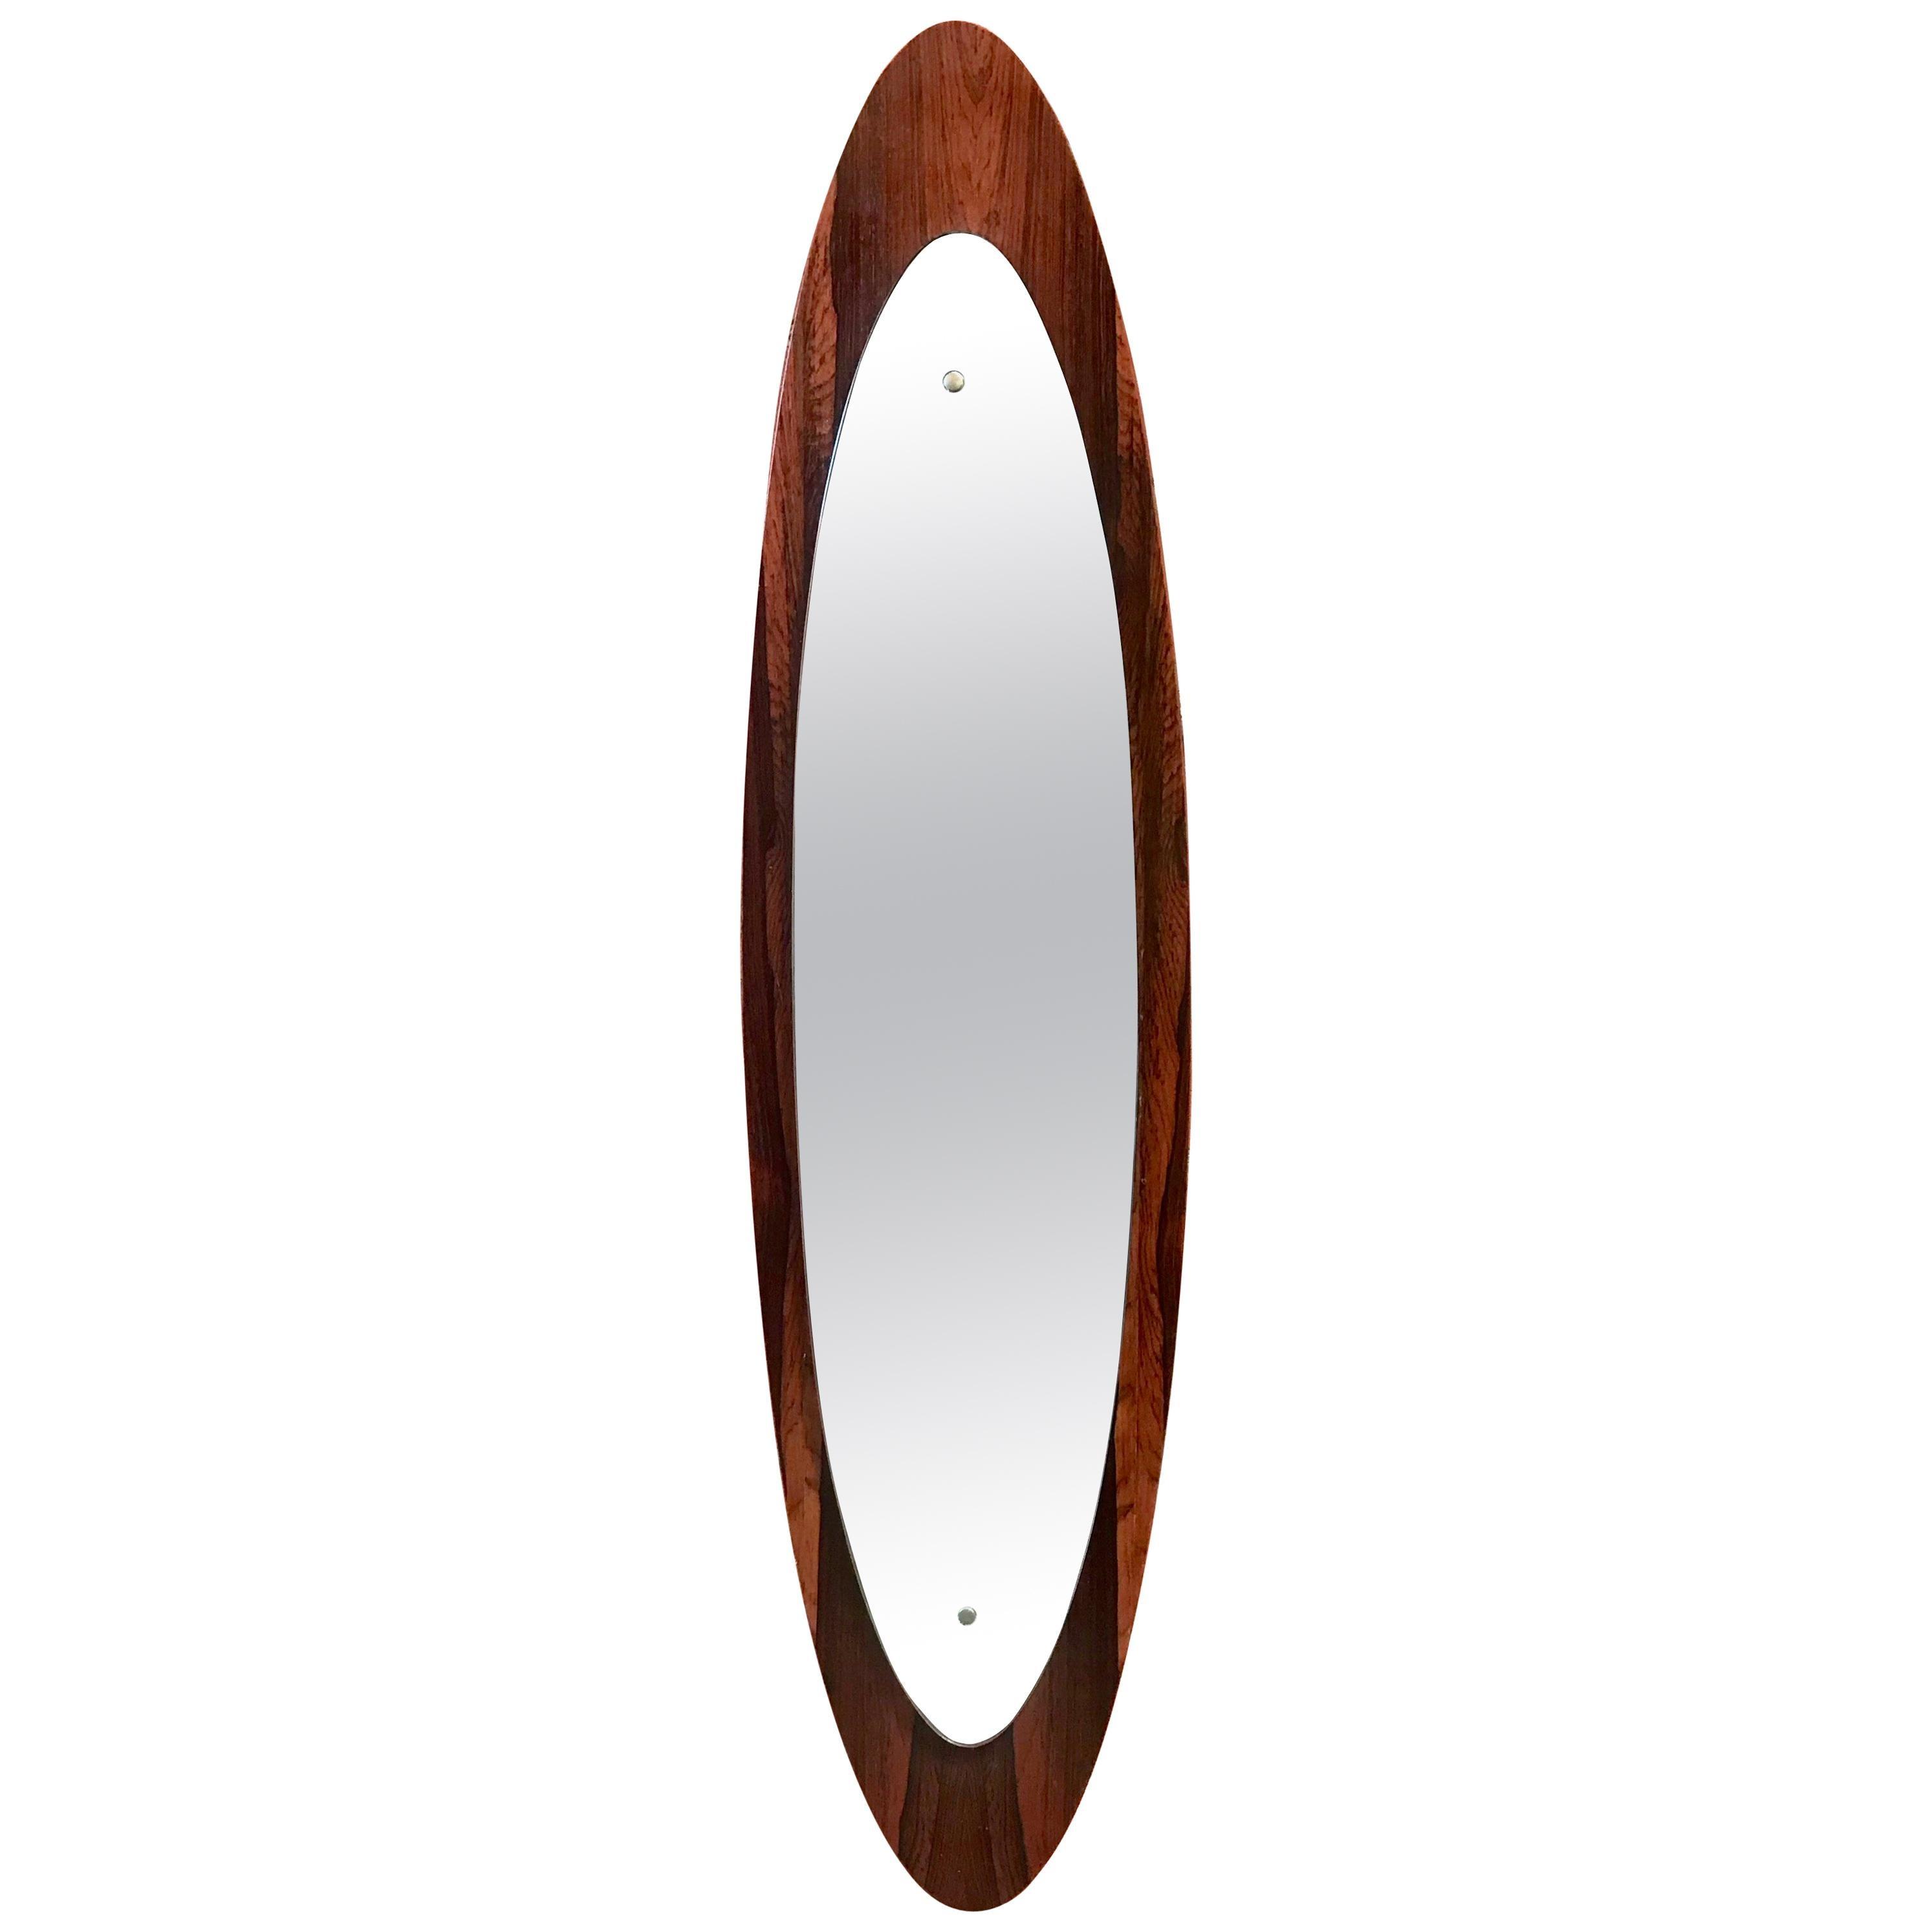 Italian Modern Wall Mirror Oval Teak Frame, 1950s